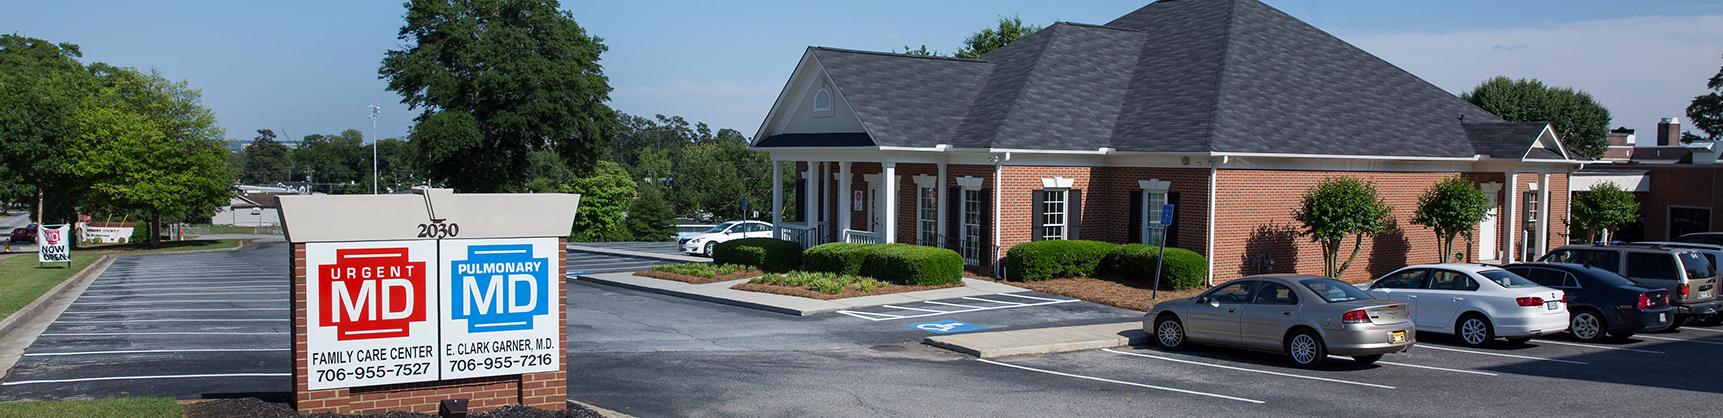 Pulmonary MD - Augusta, GA